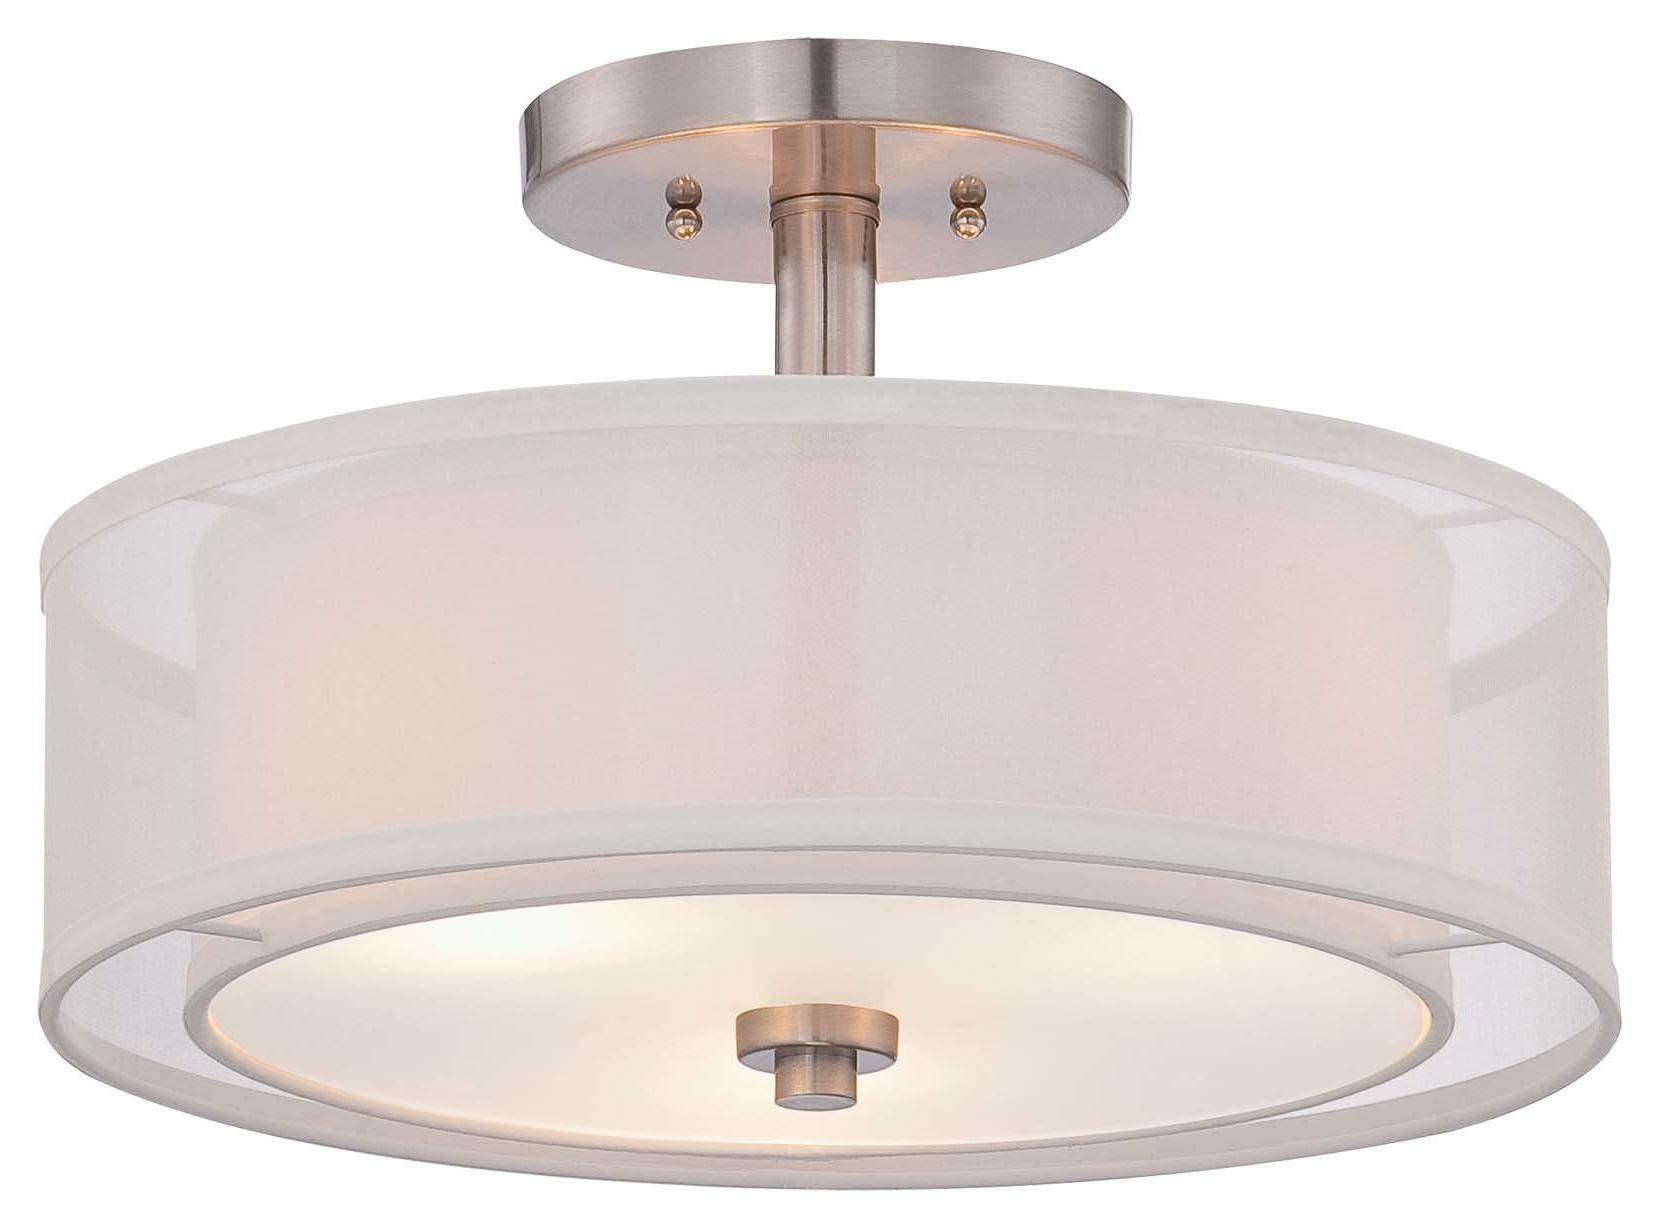 Demby 3-Light Semi Flush Mount inside 2020 Radtke 3-Light Single Drum Pendants